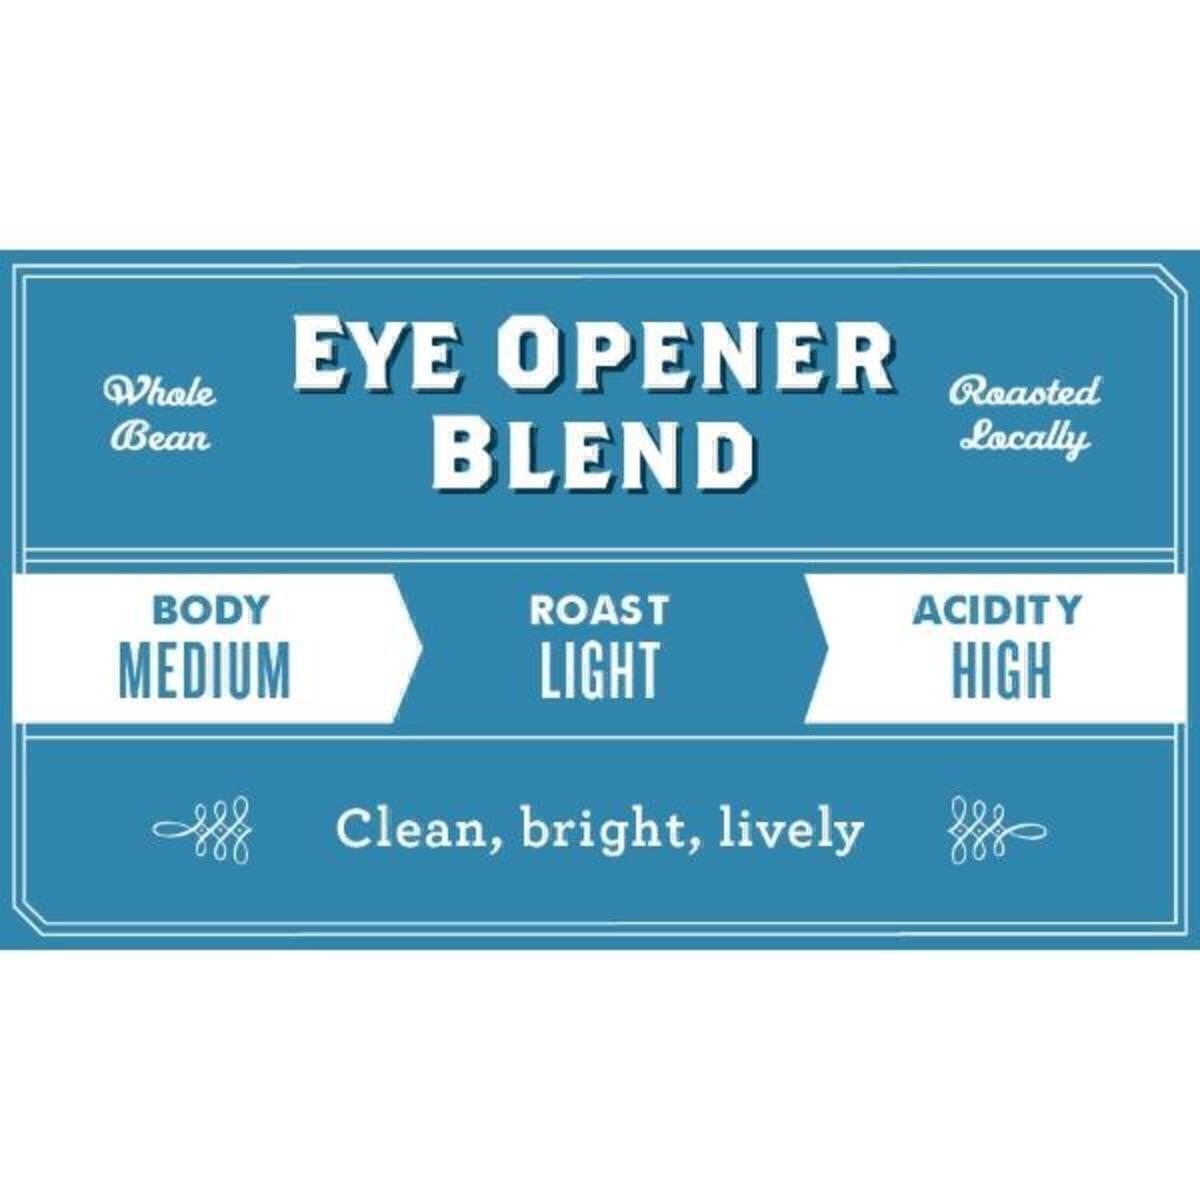 Barriques Eye Opener 5lb